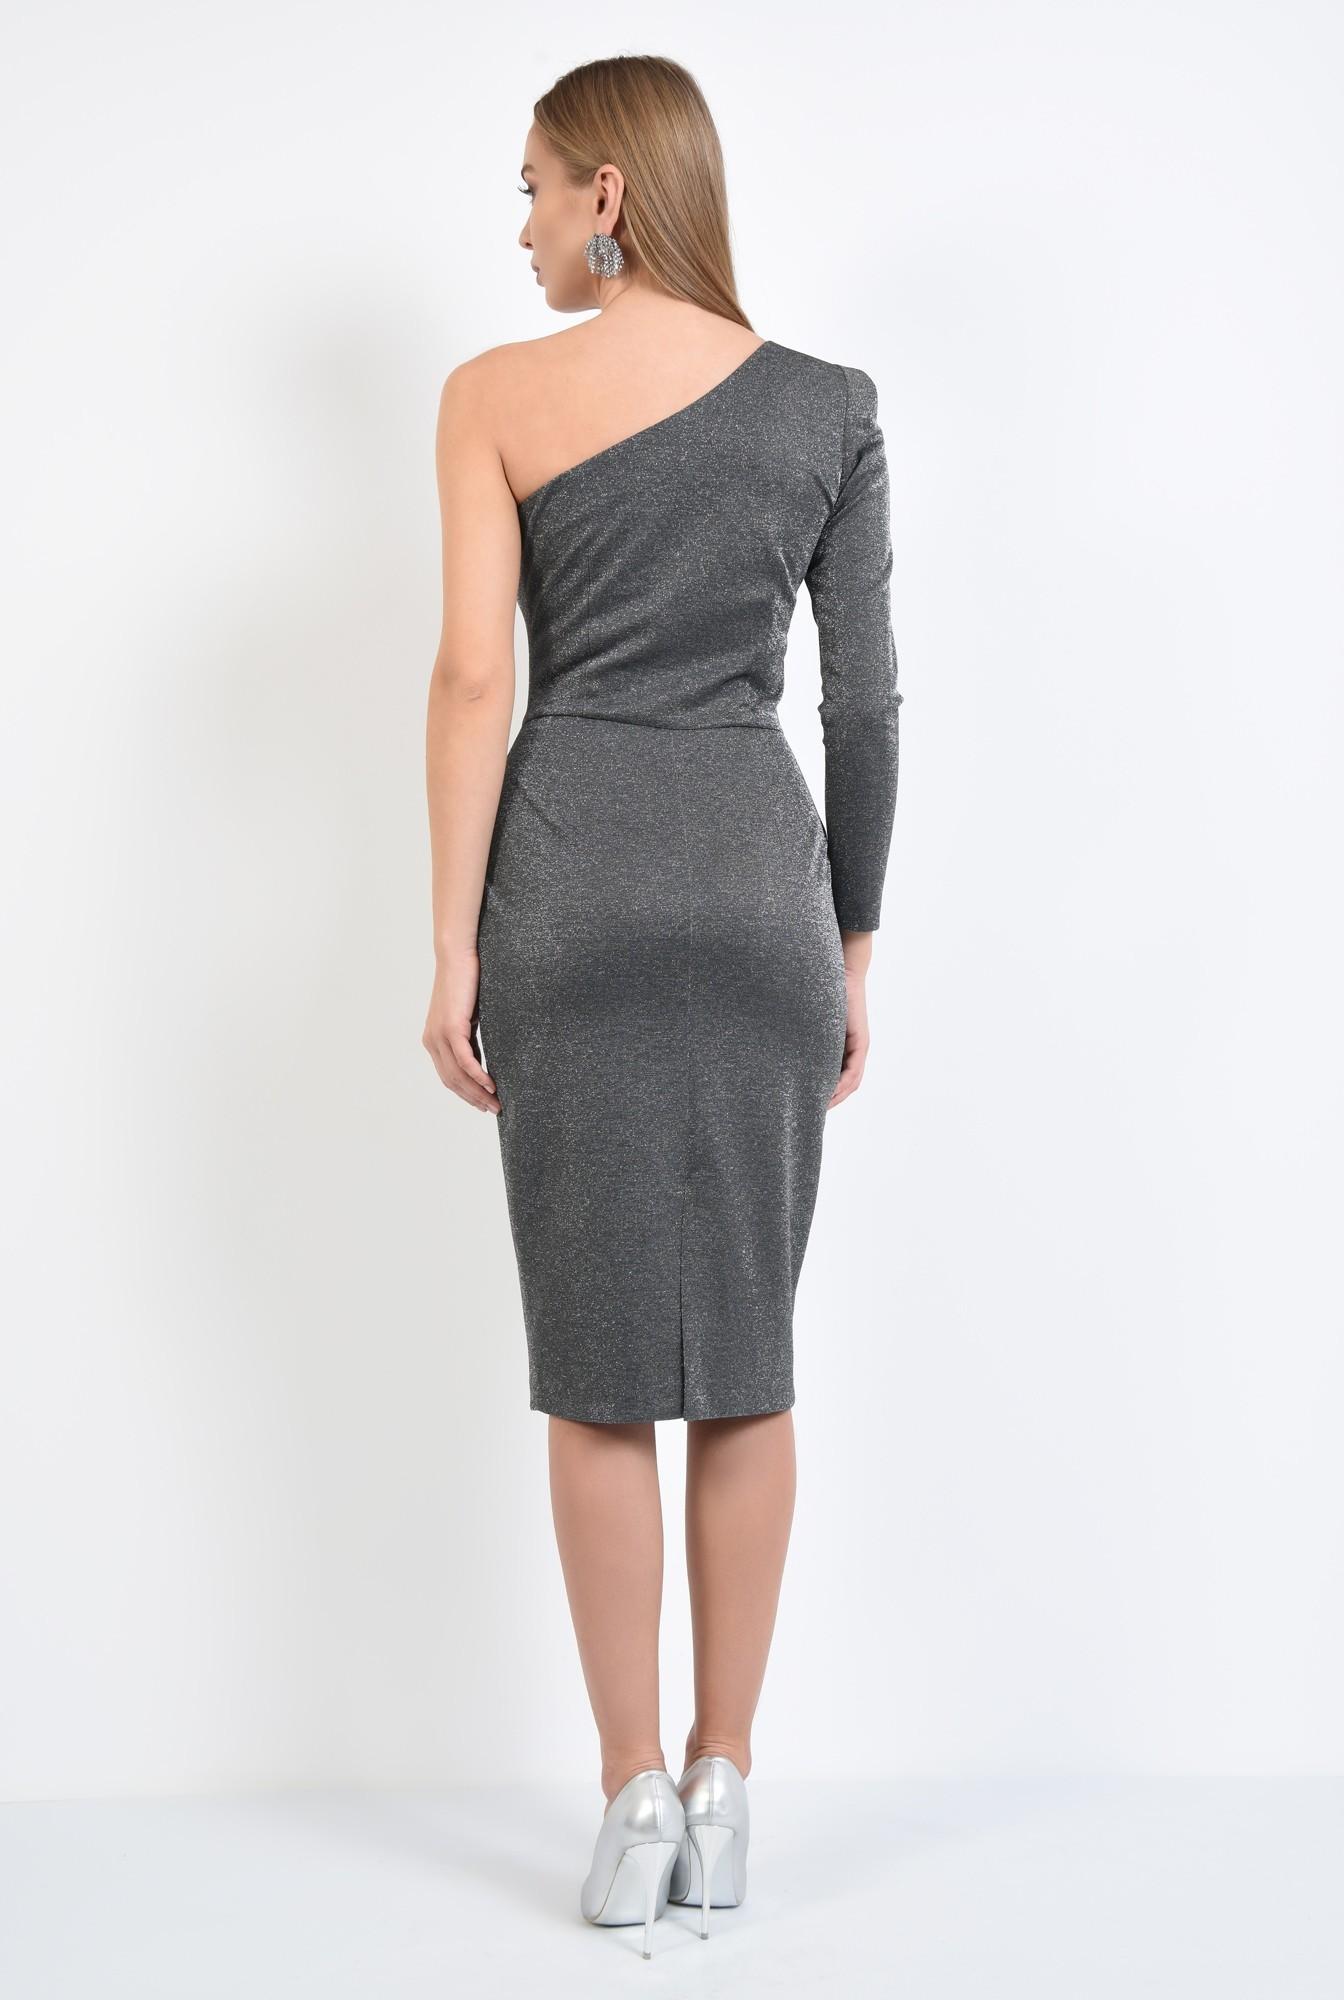 1 - rochie eleganta, conica, midi, argintie, rochii online